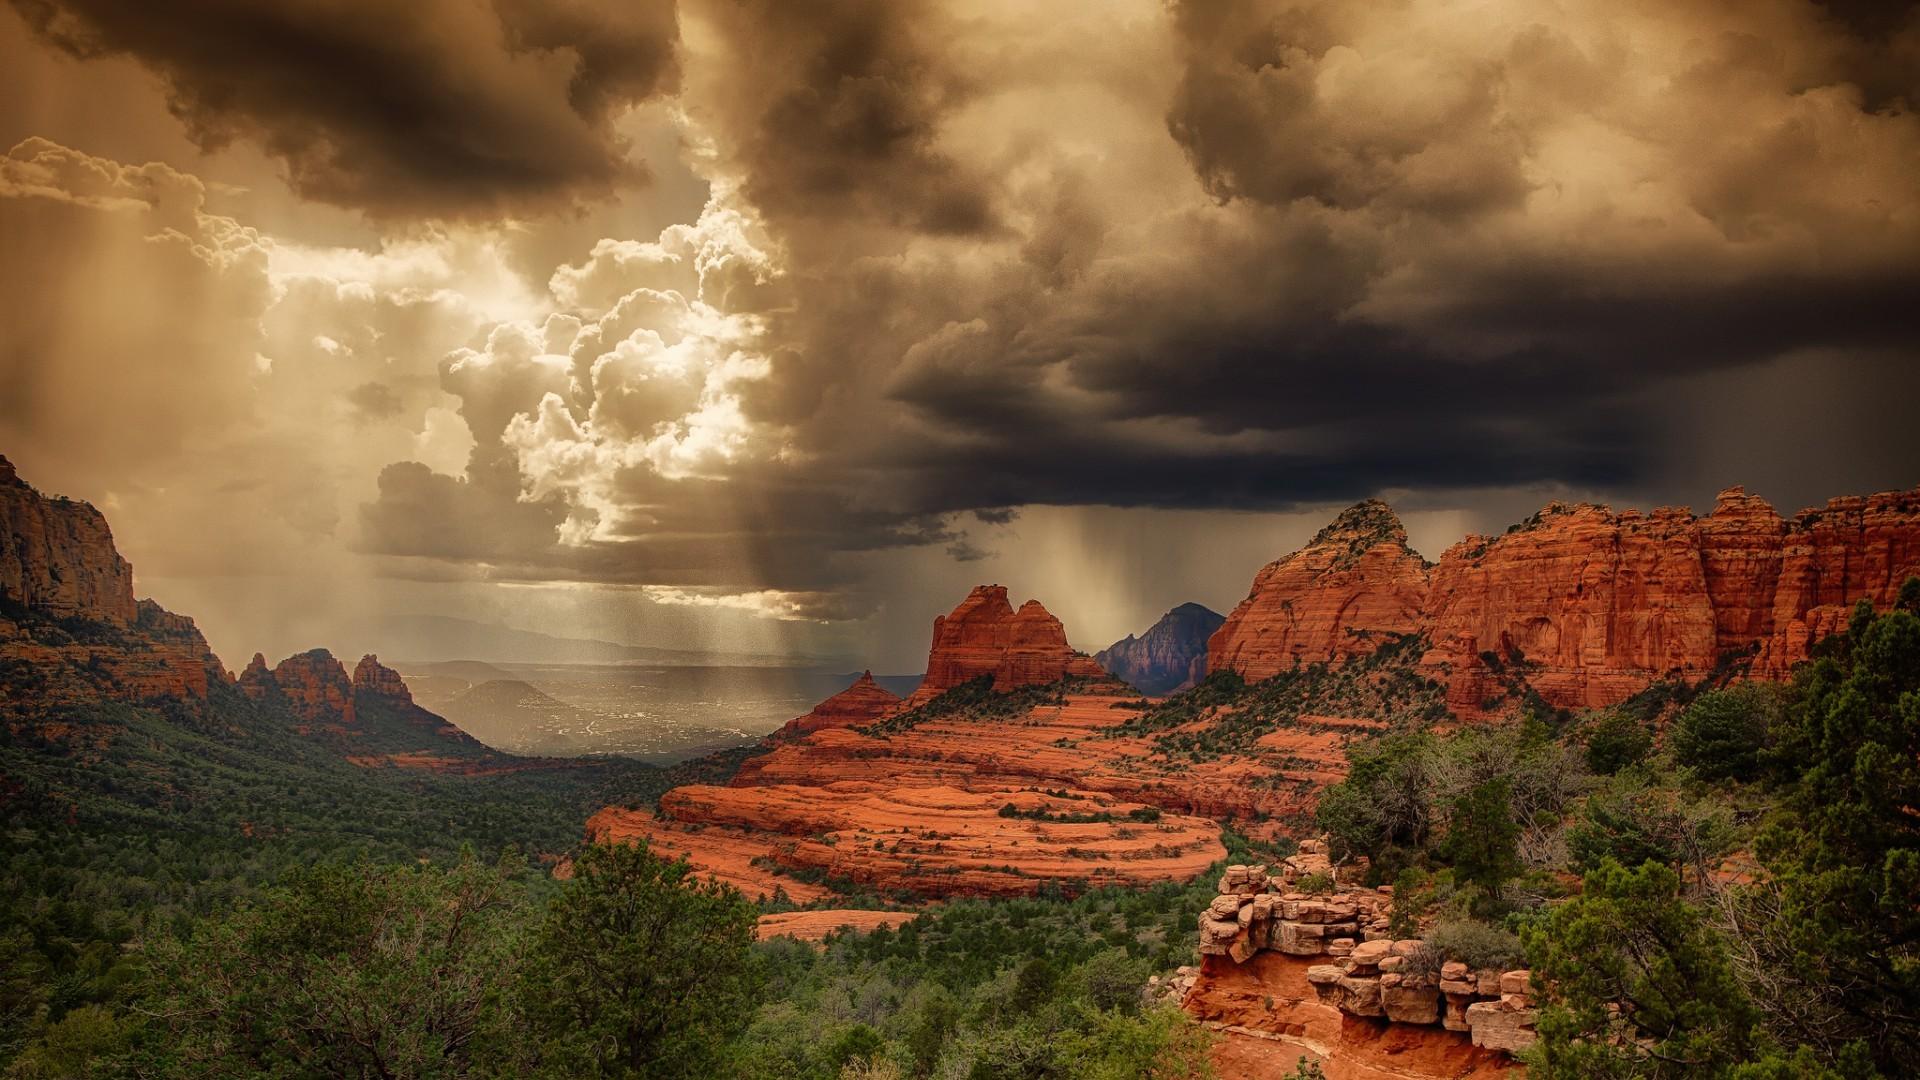 Desktop wallpapers Storm clouds over the red rocks of Sedona, Arizona .